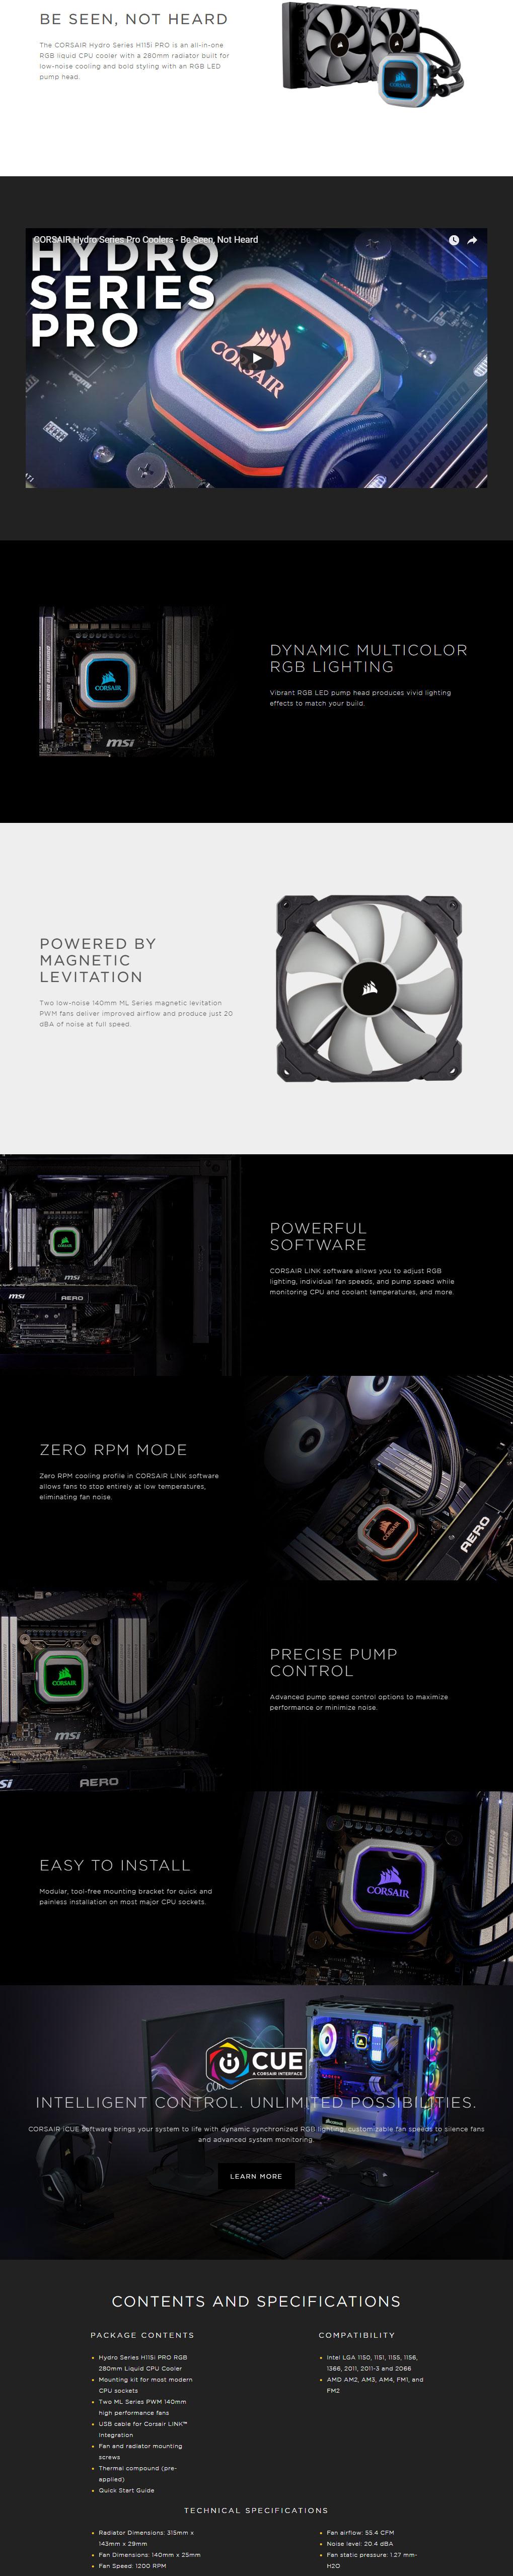 Buy Corsair H115i Pro RGB 280mm Liquid Cooler Online, Australia